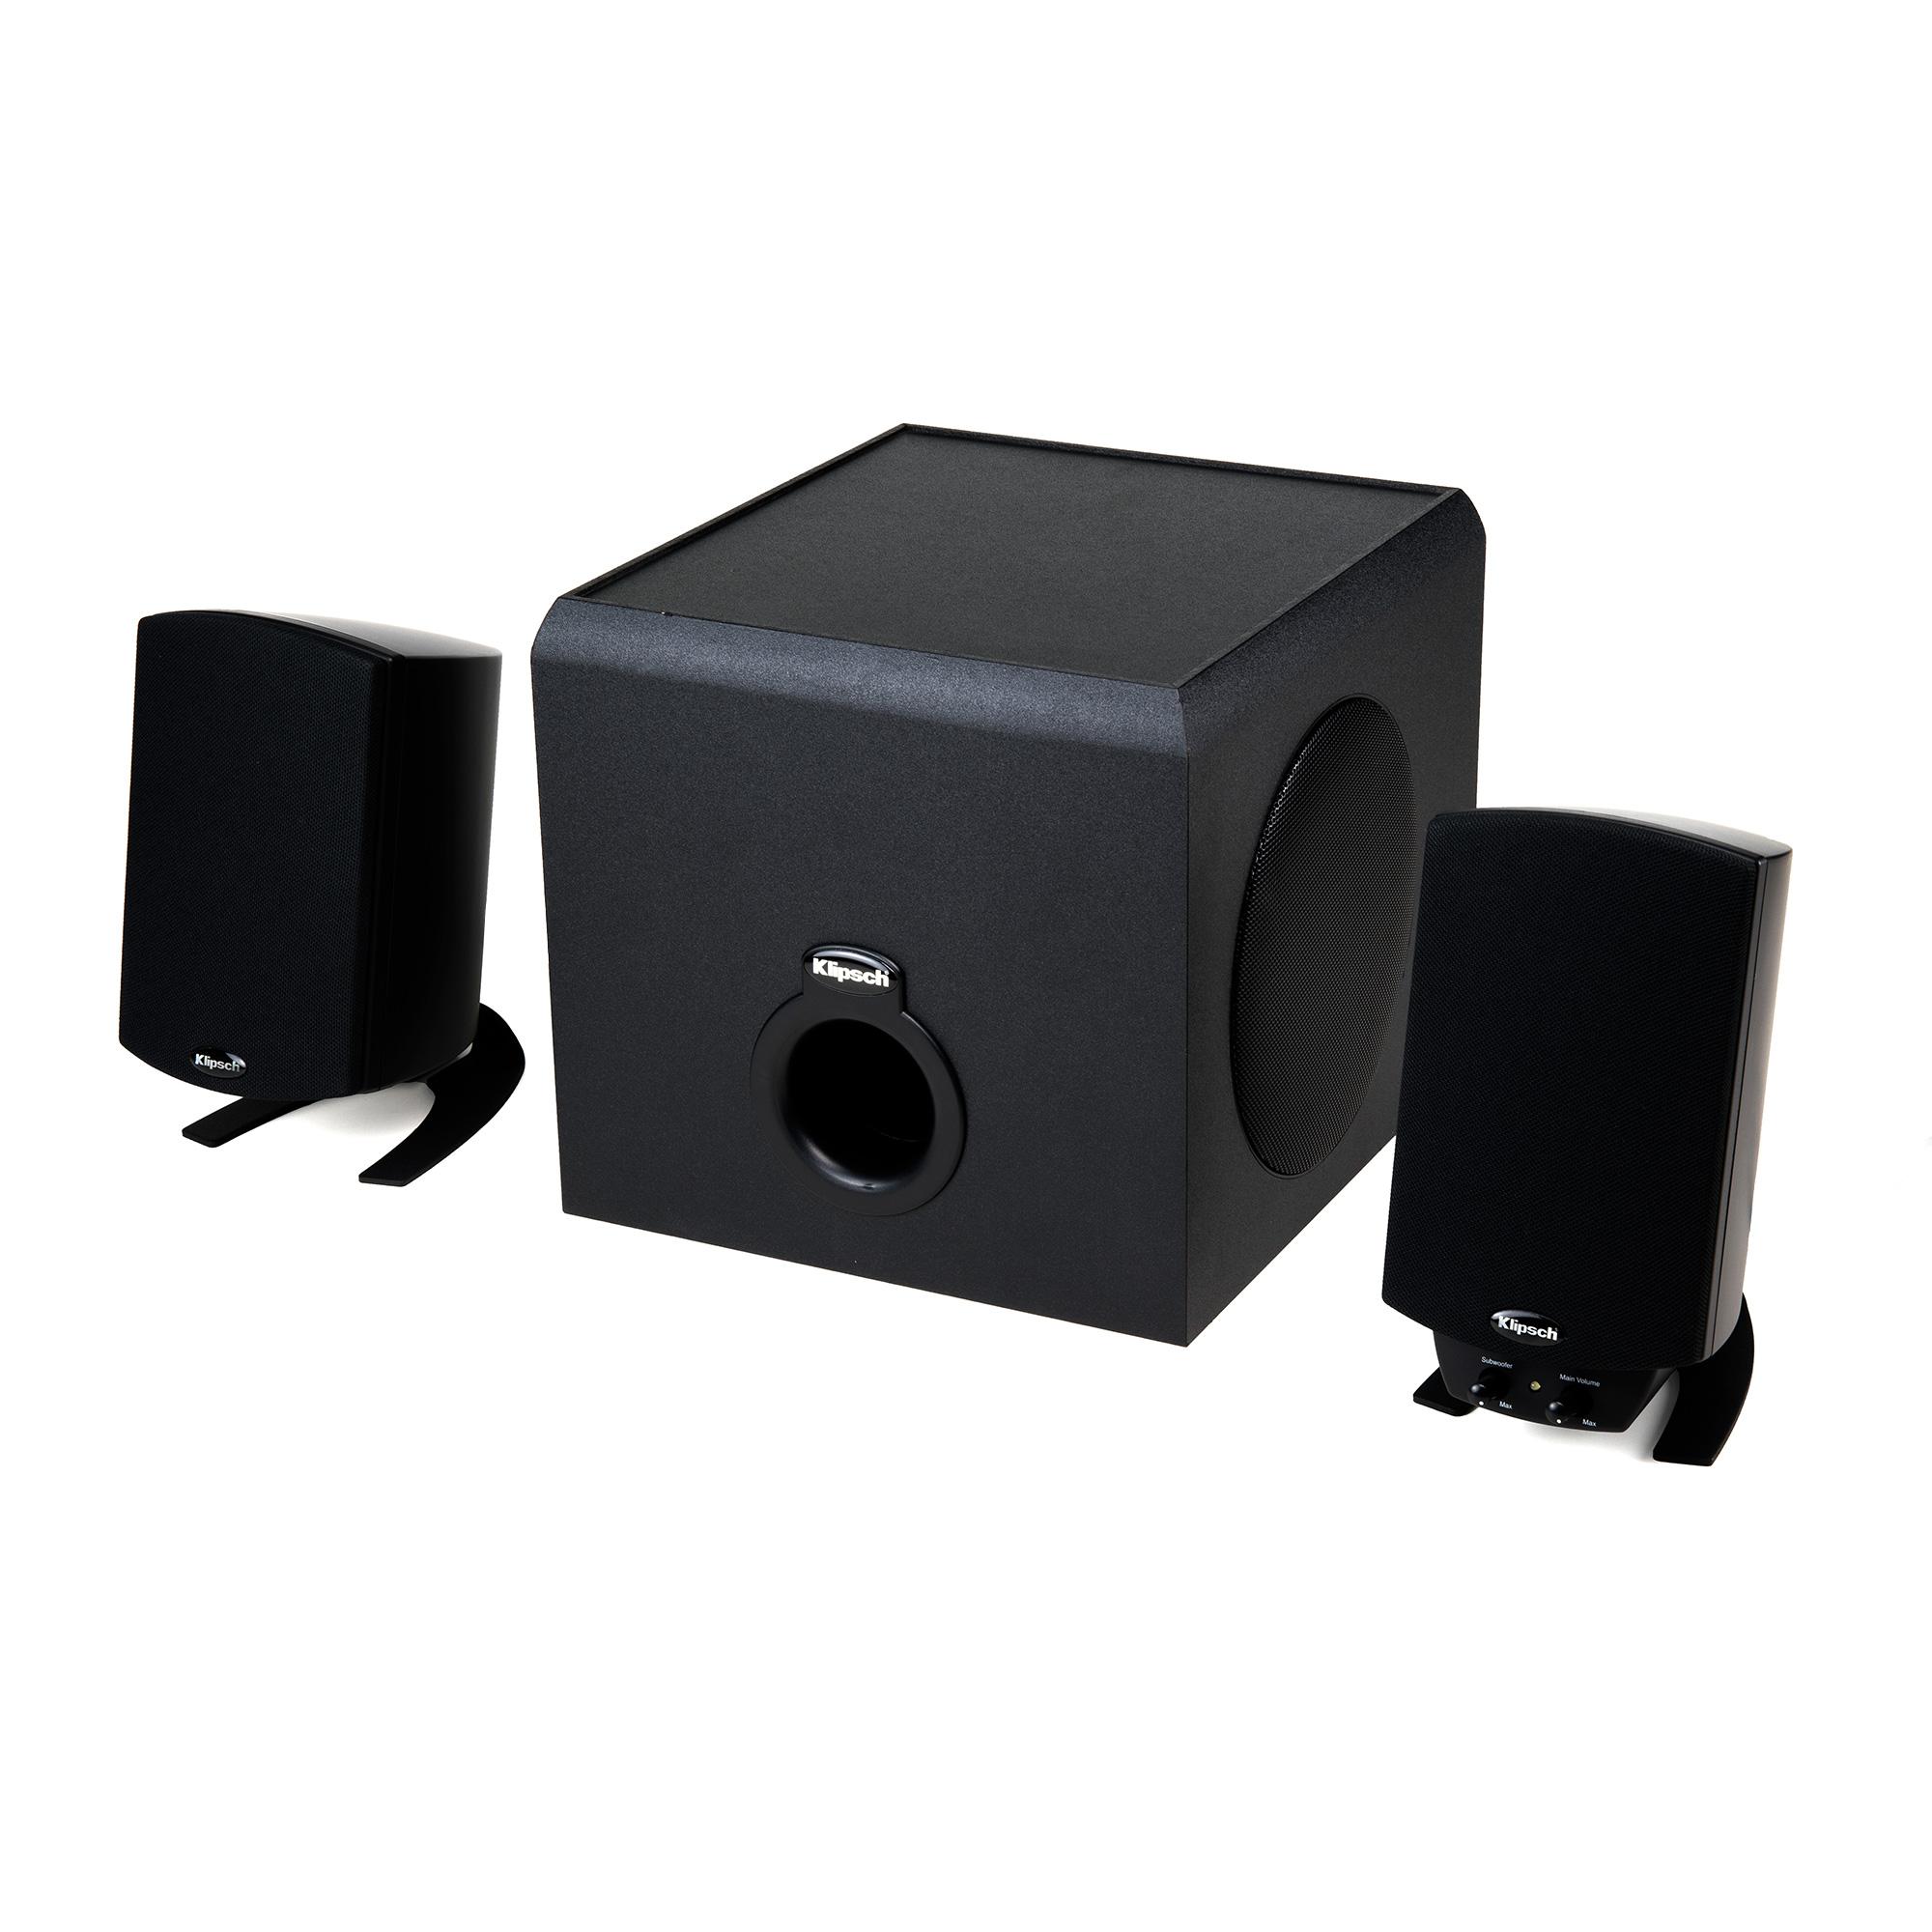 Sony Sound Bar Wiring Diagram Promedia 2 1 Bluetooth Computer Speakers Klipsch